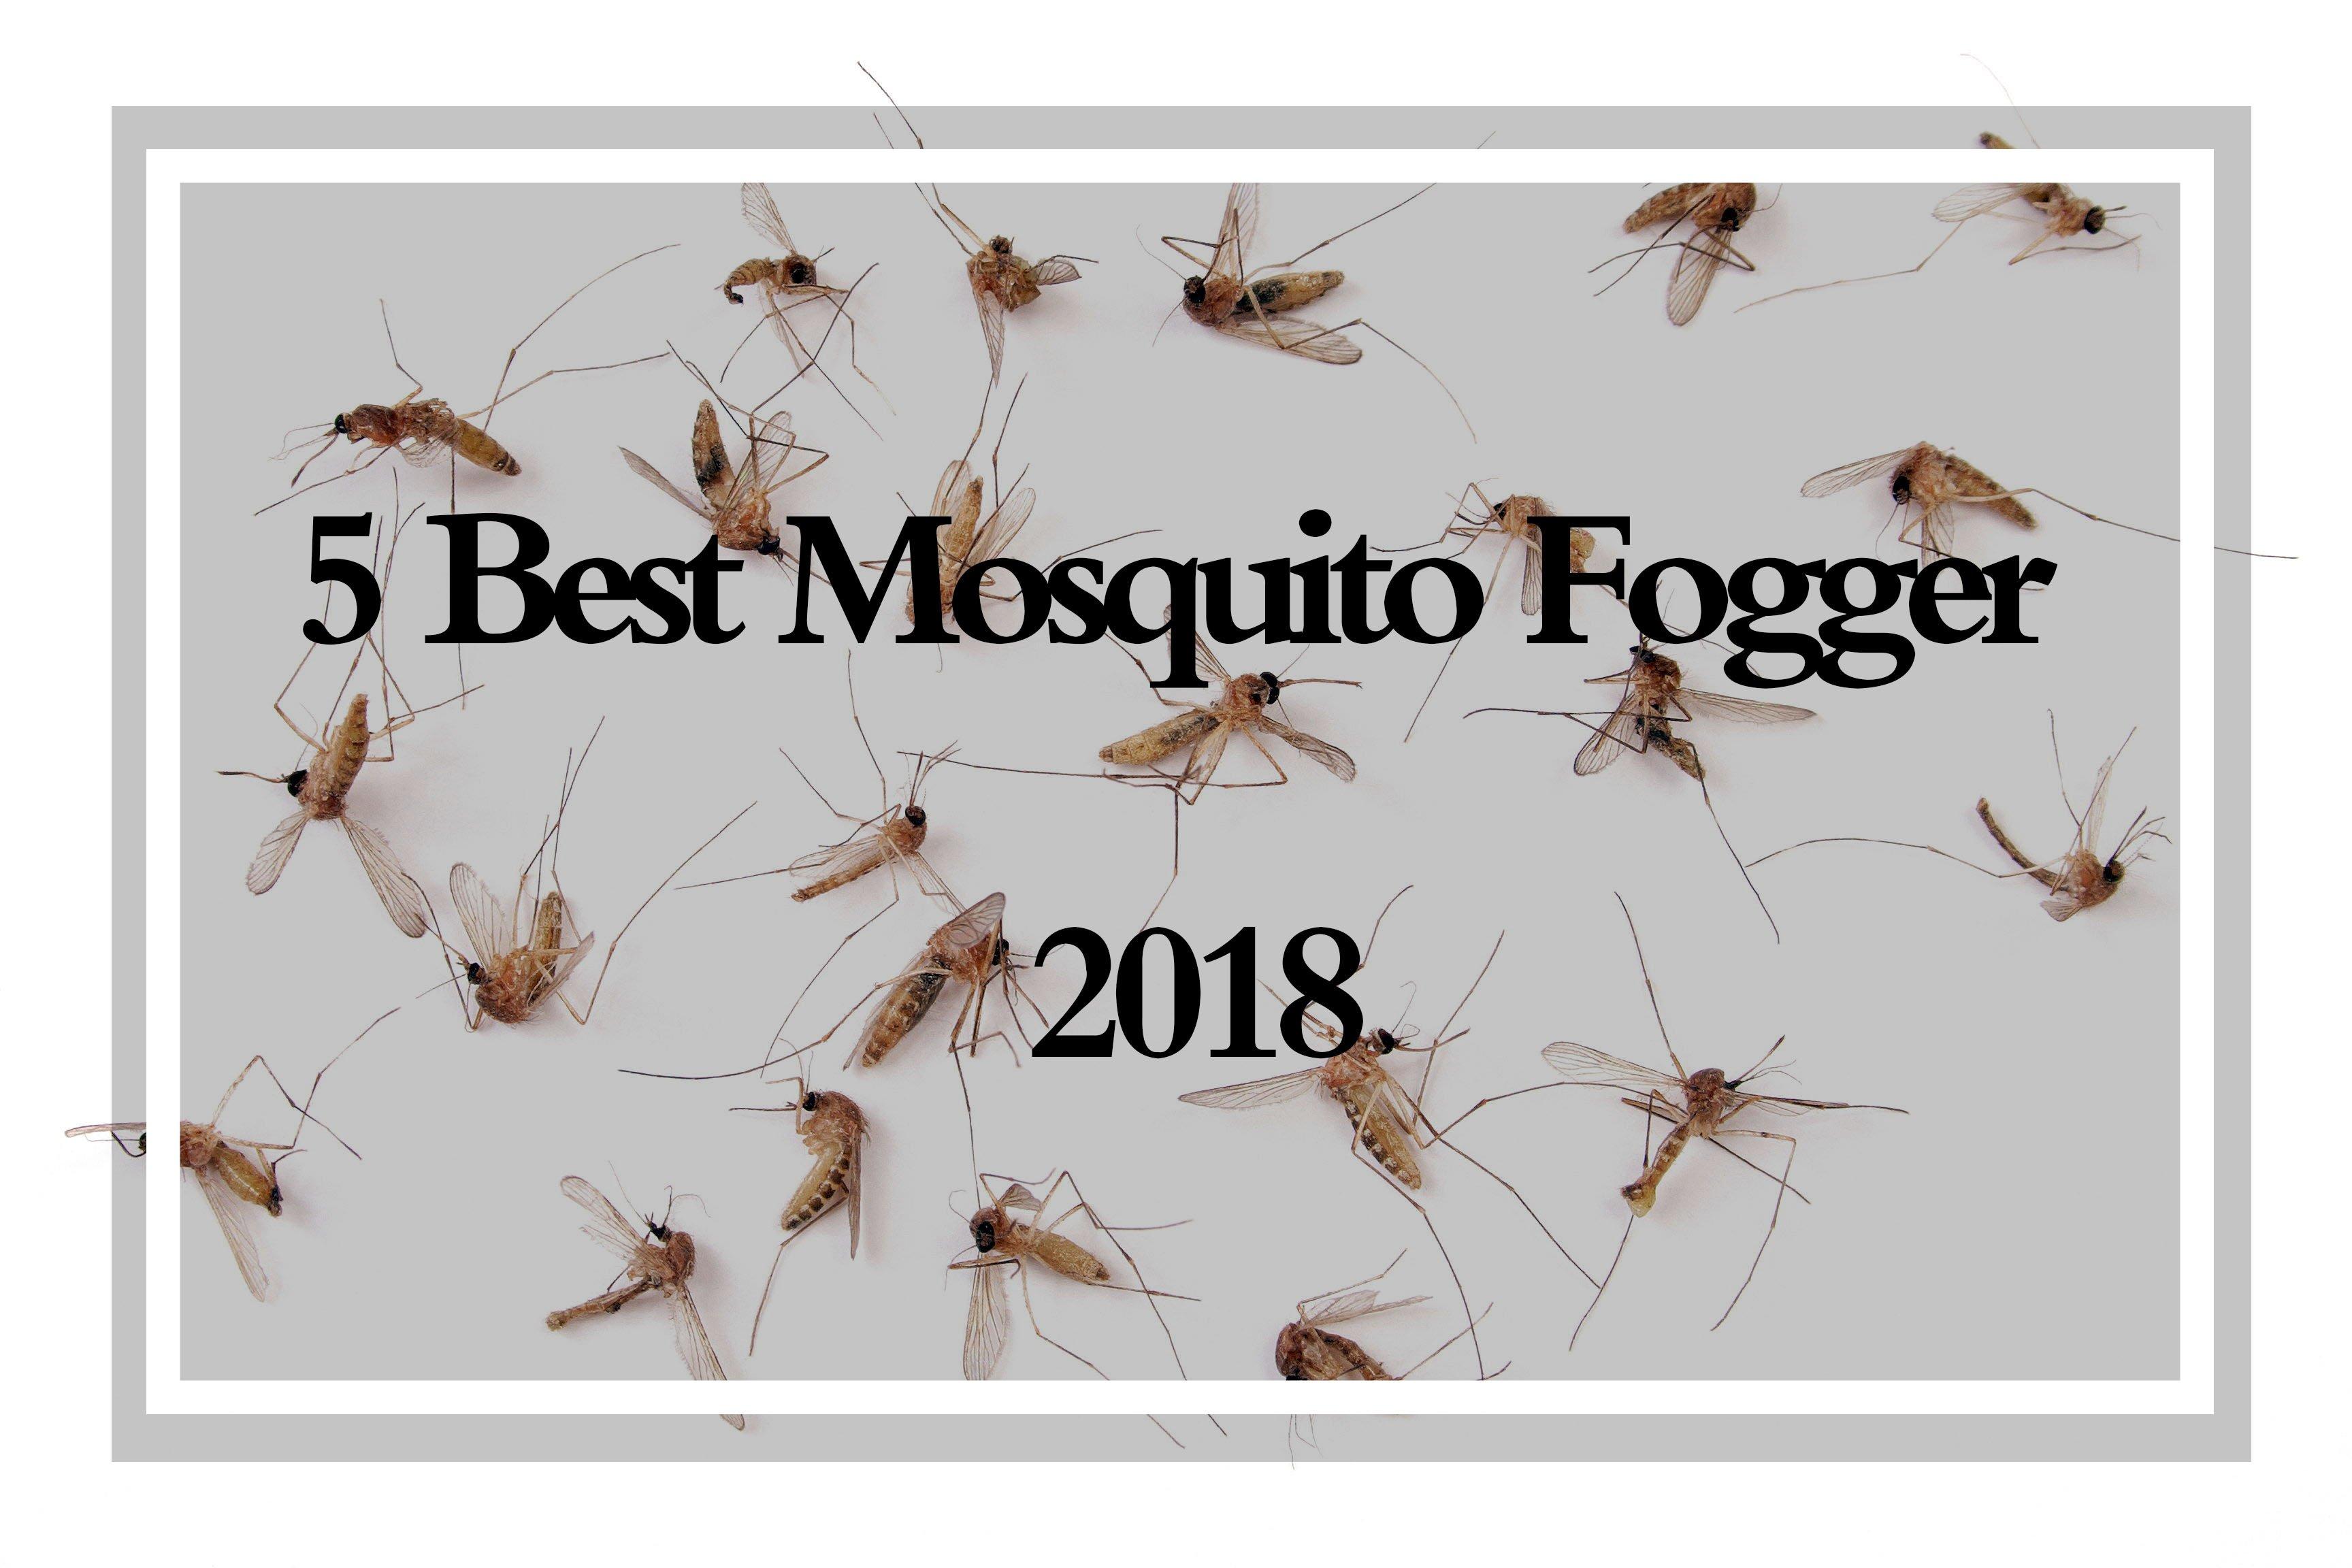 Mosquito Fogger